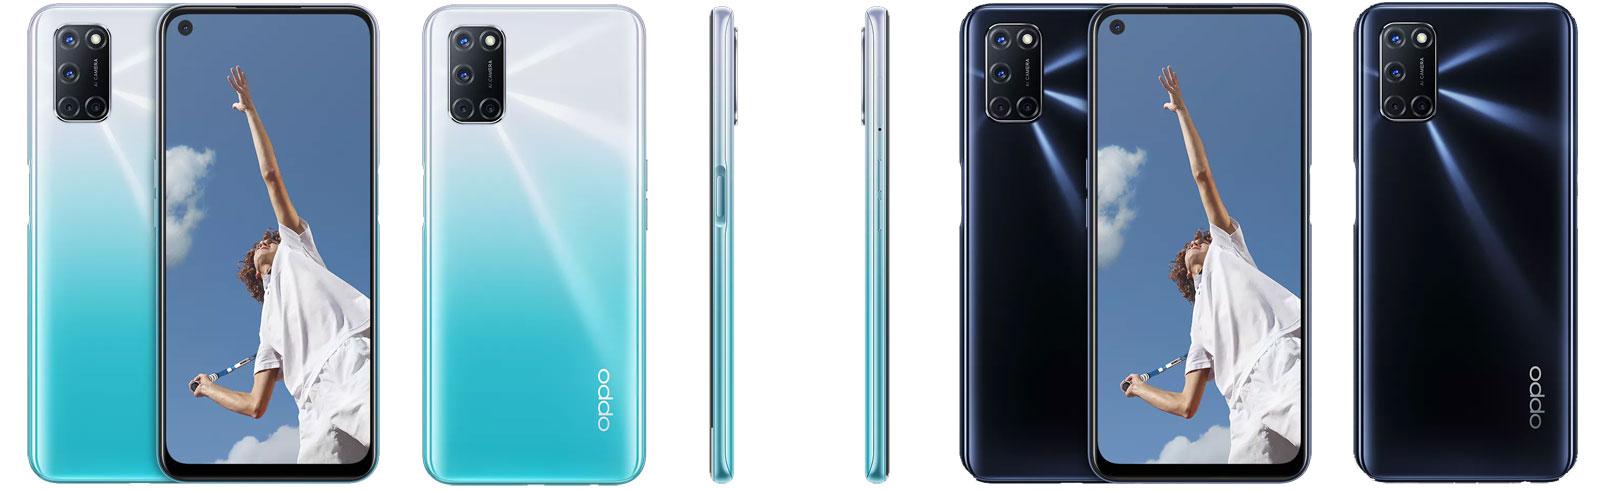 Oppo A52 обзор, характеристики, отзывы, цена